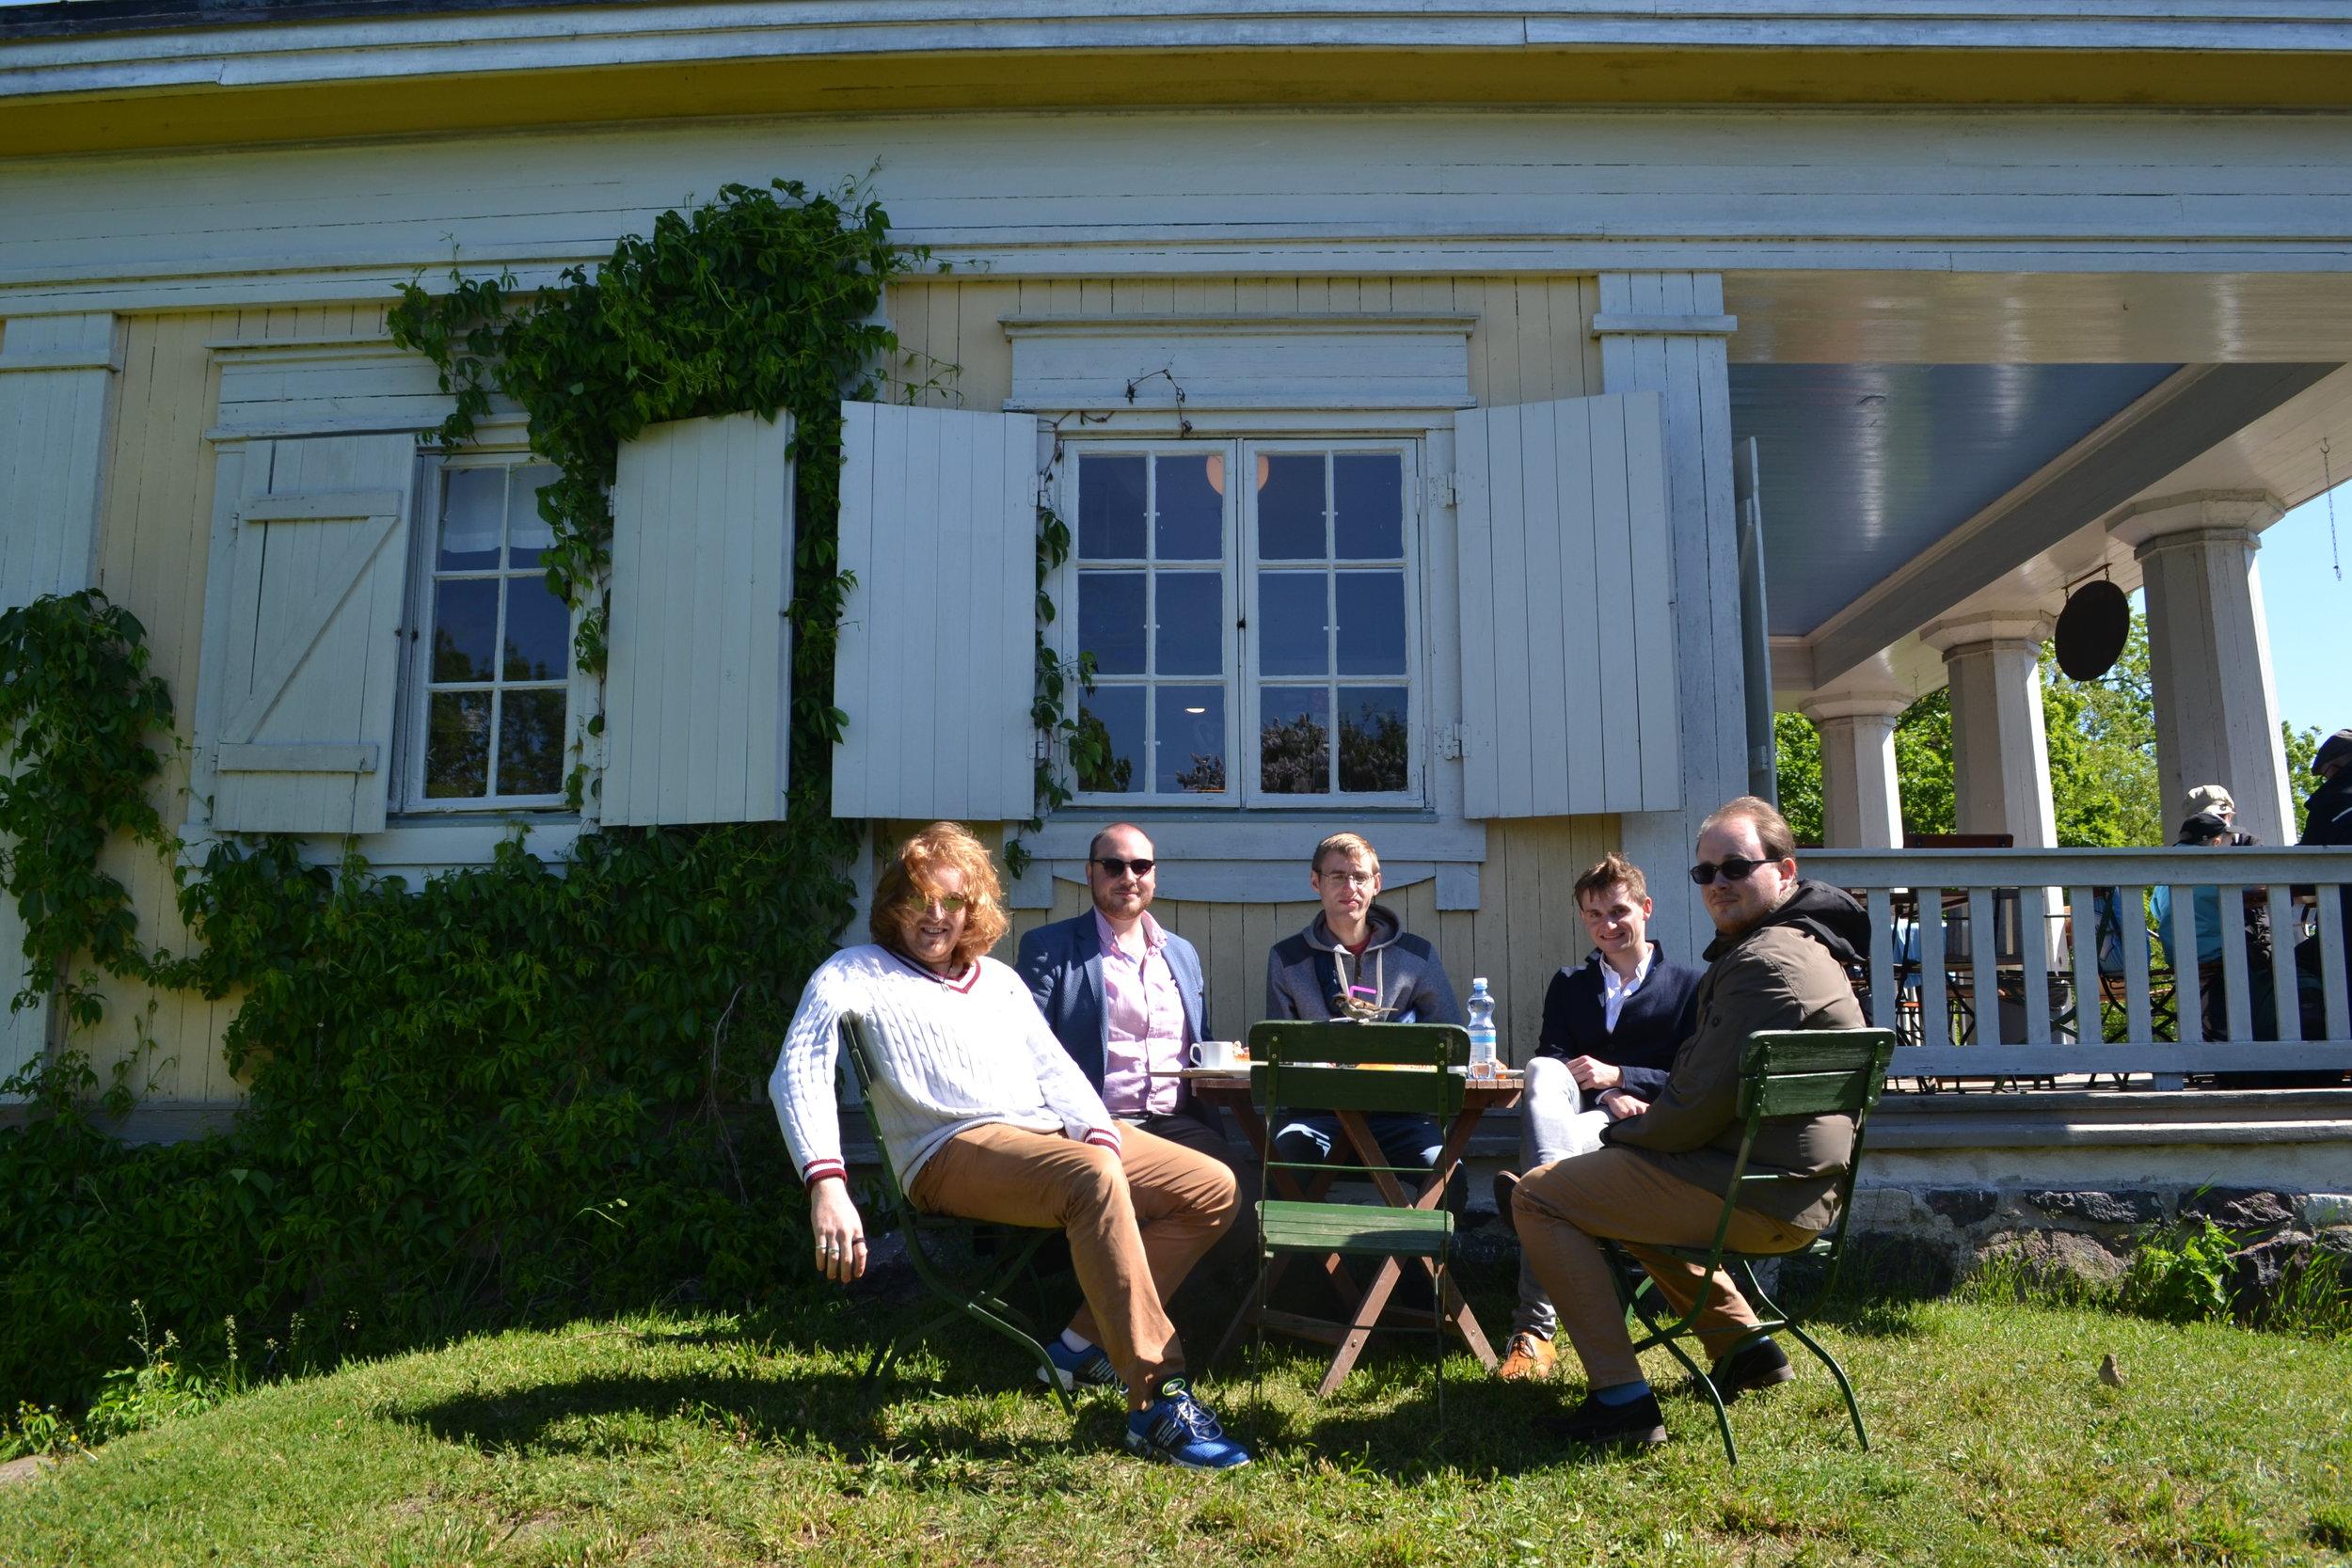 Sommerresidenz auf Suomenlinna | Nobiles in residence